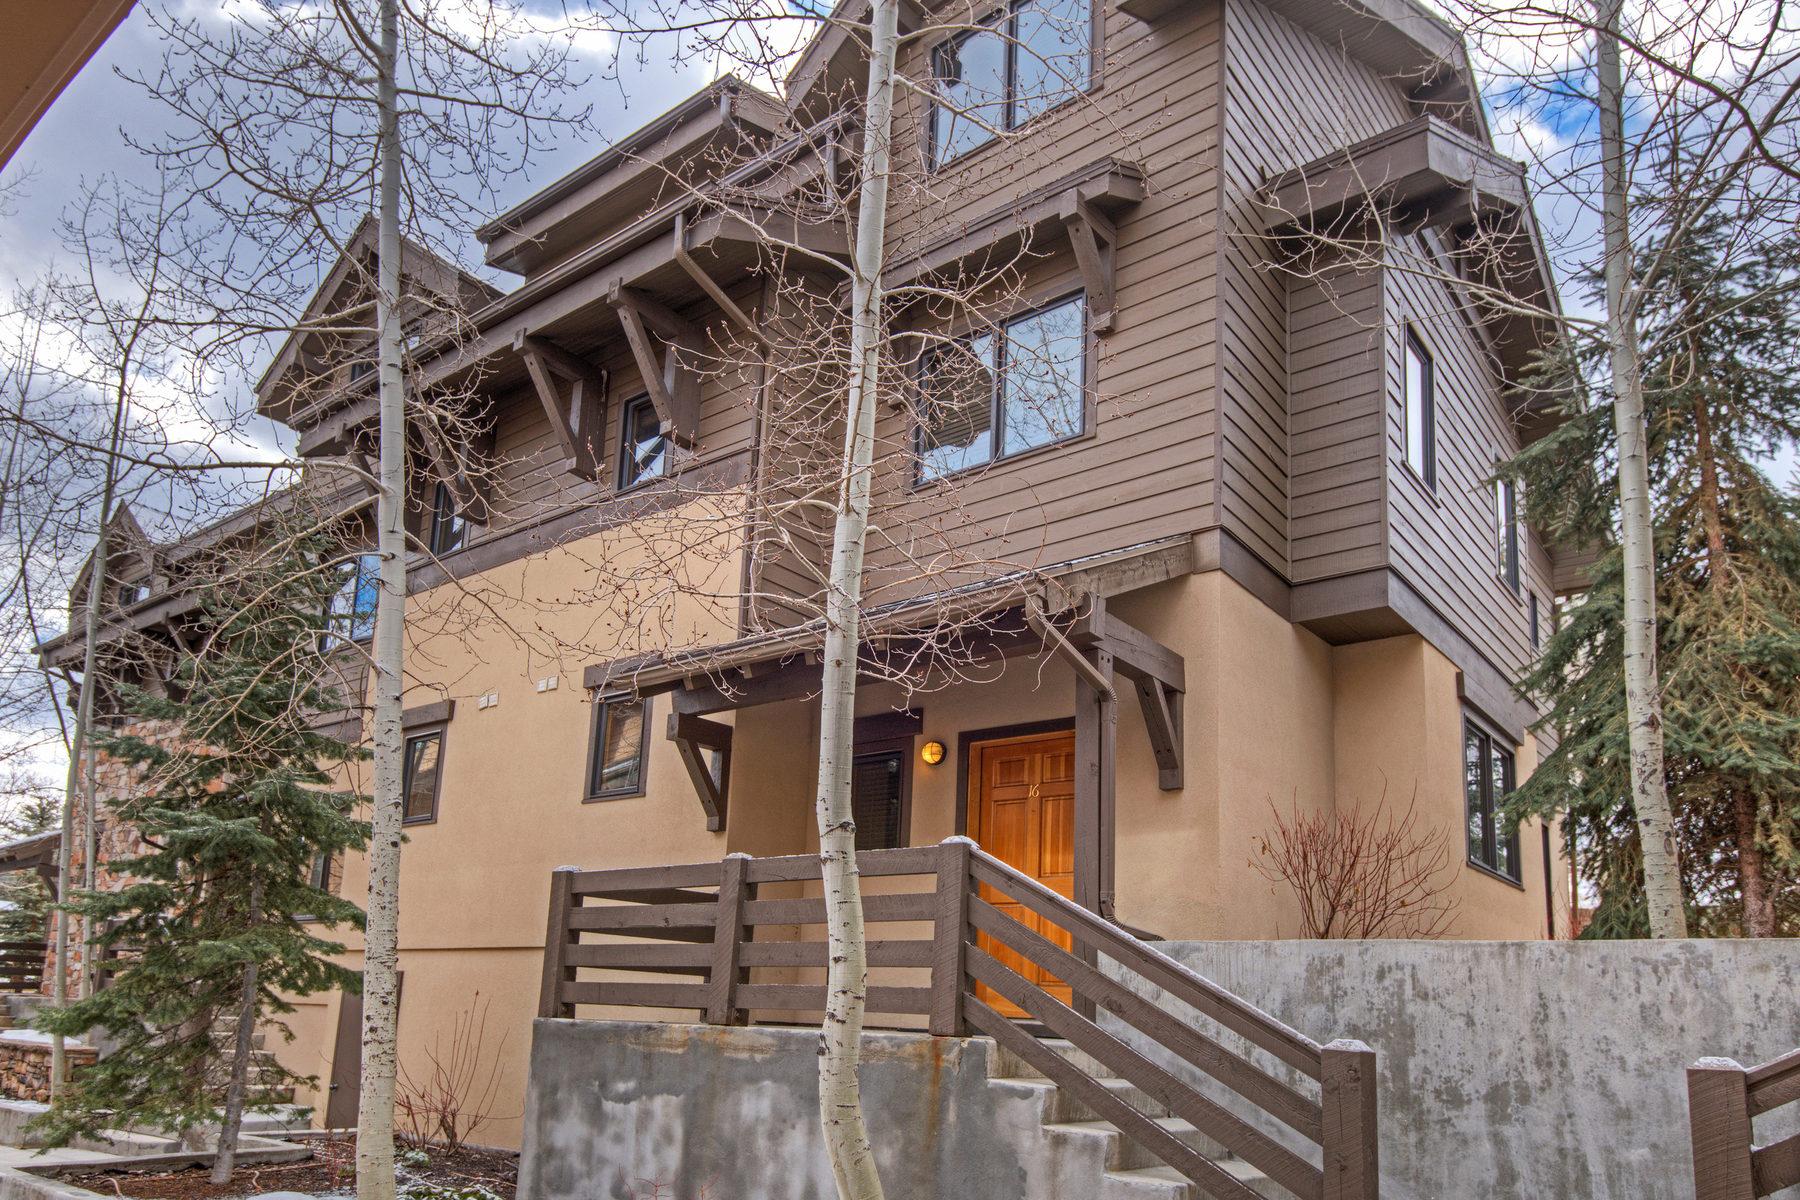 联栋屋 为 销售 在 Three Bedroom Townhome in Old Town Park City 670 Deer Valley Loop #16 Park City, 犹他州 84060 美国